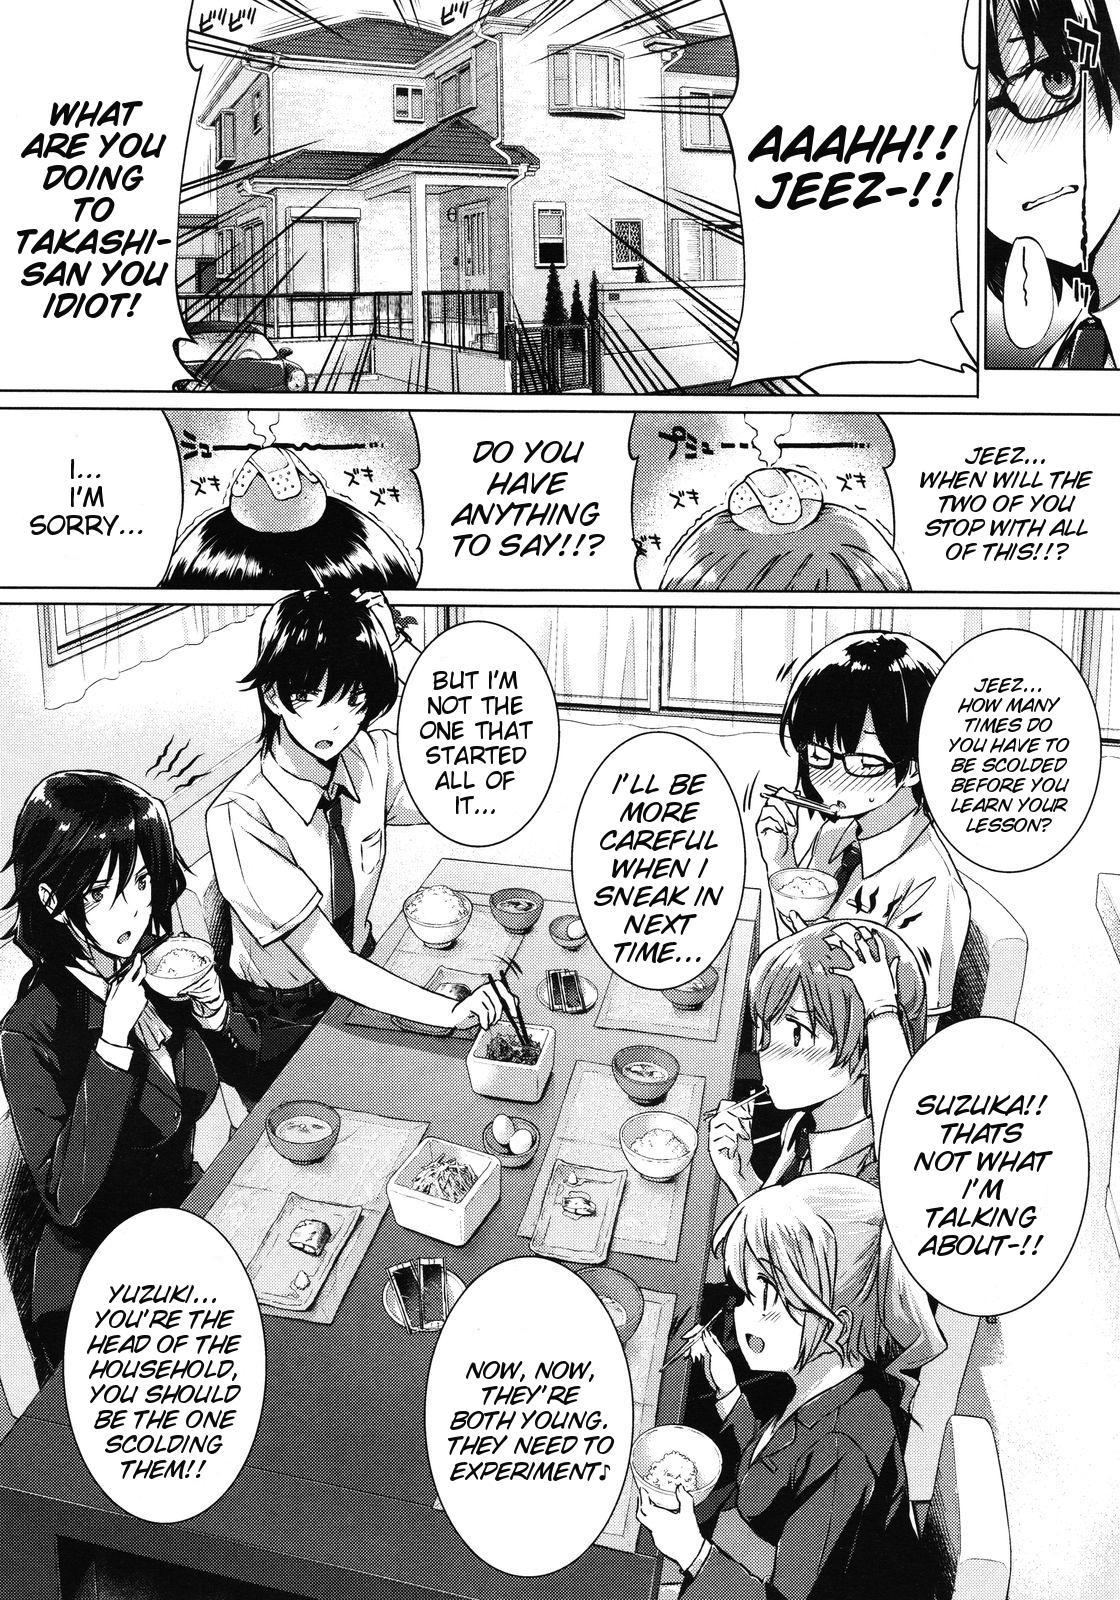 [Katsurai Yoshiaki] Kanojo wa Kazoku de Koibito de Ch. 1-3   She's My Family And My Lover Ch. 1-3 [English] {doujin-moe.us} 7